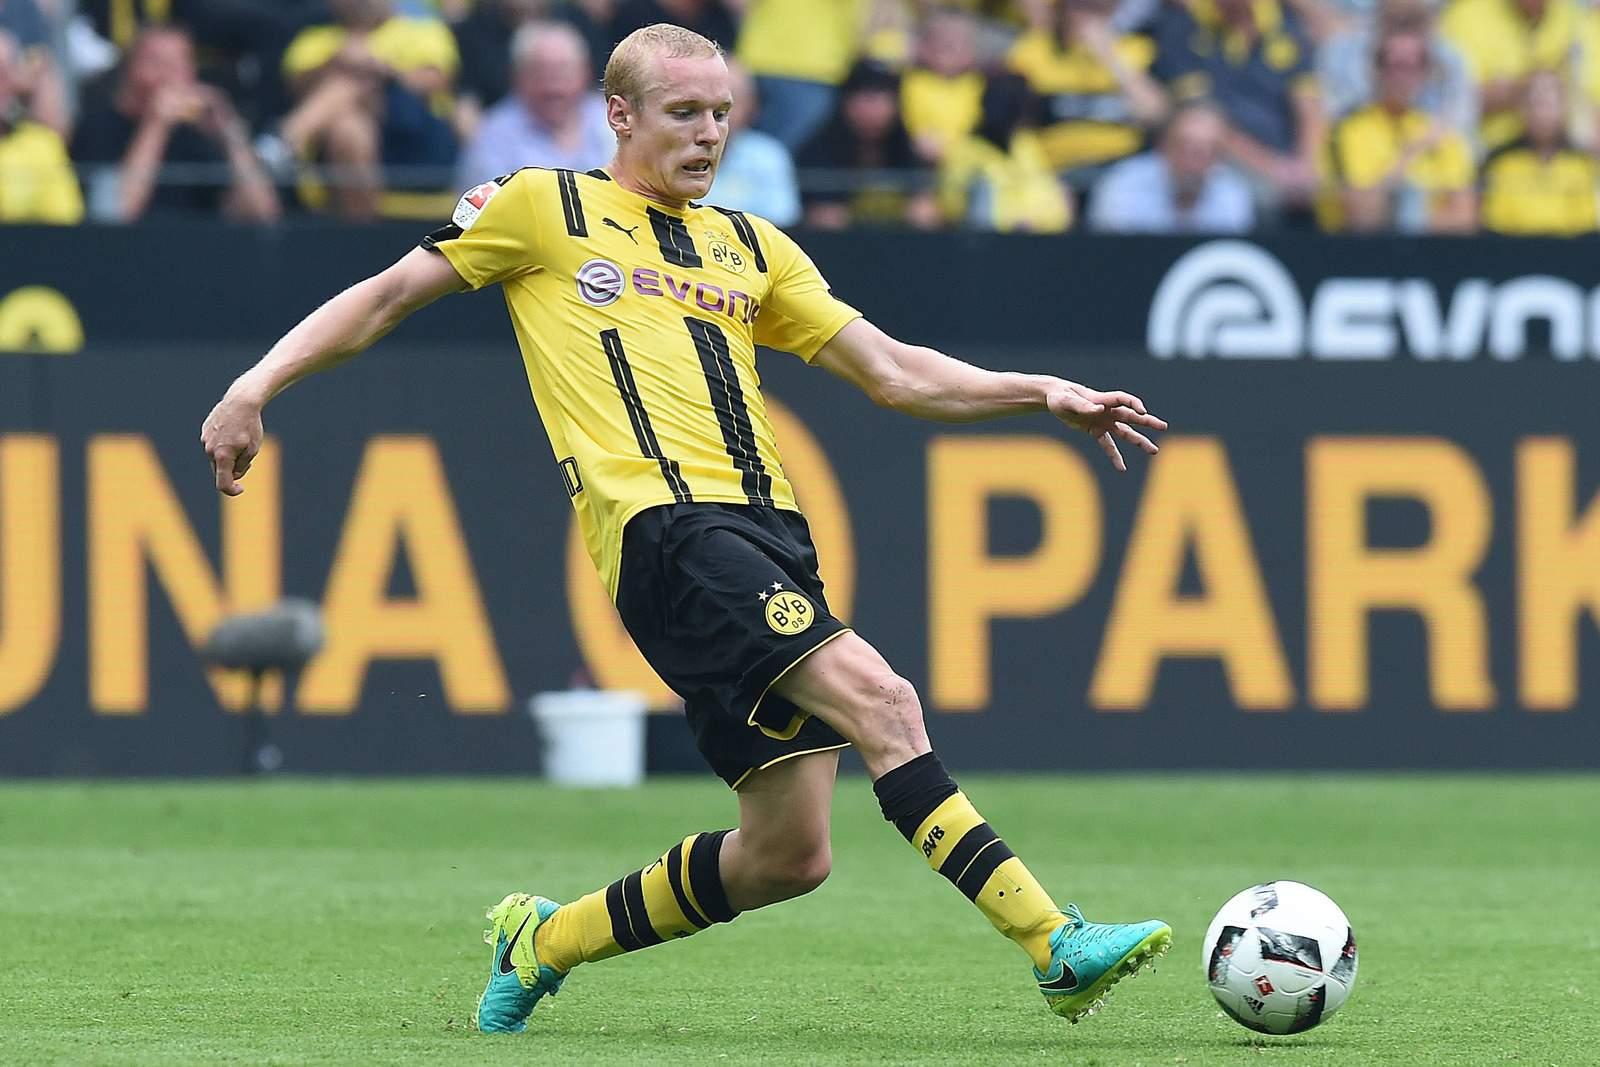 Sebastian Rode am Ball. Jetzt auf Legia Warschau gegen BVB wetten!